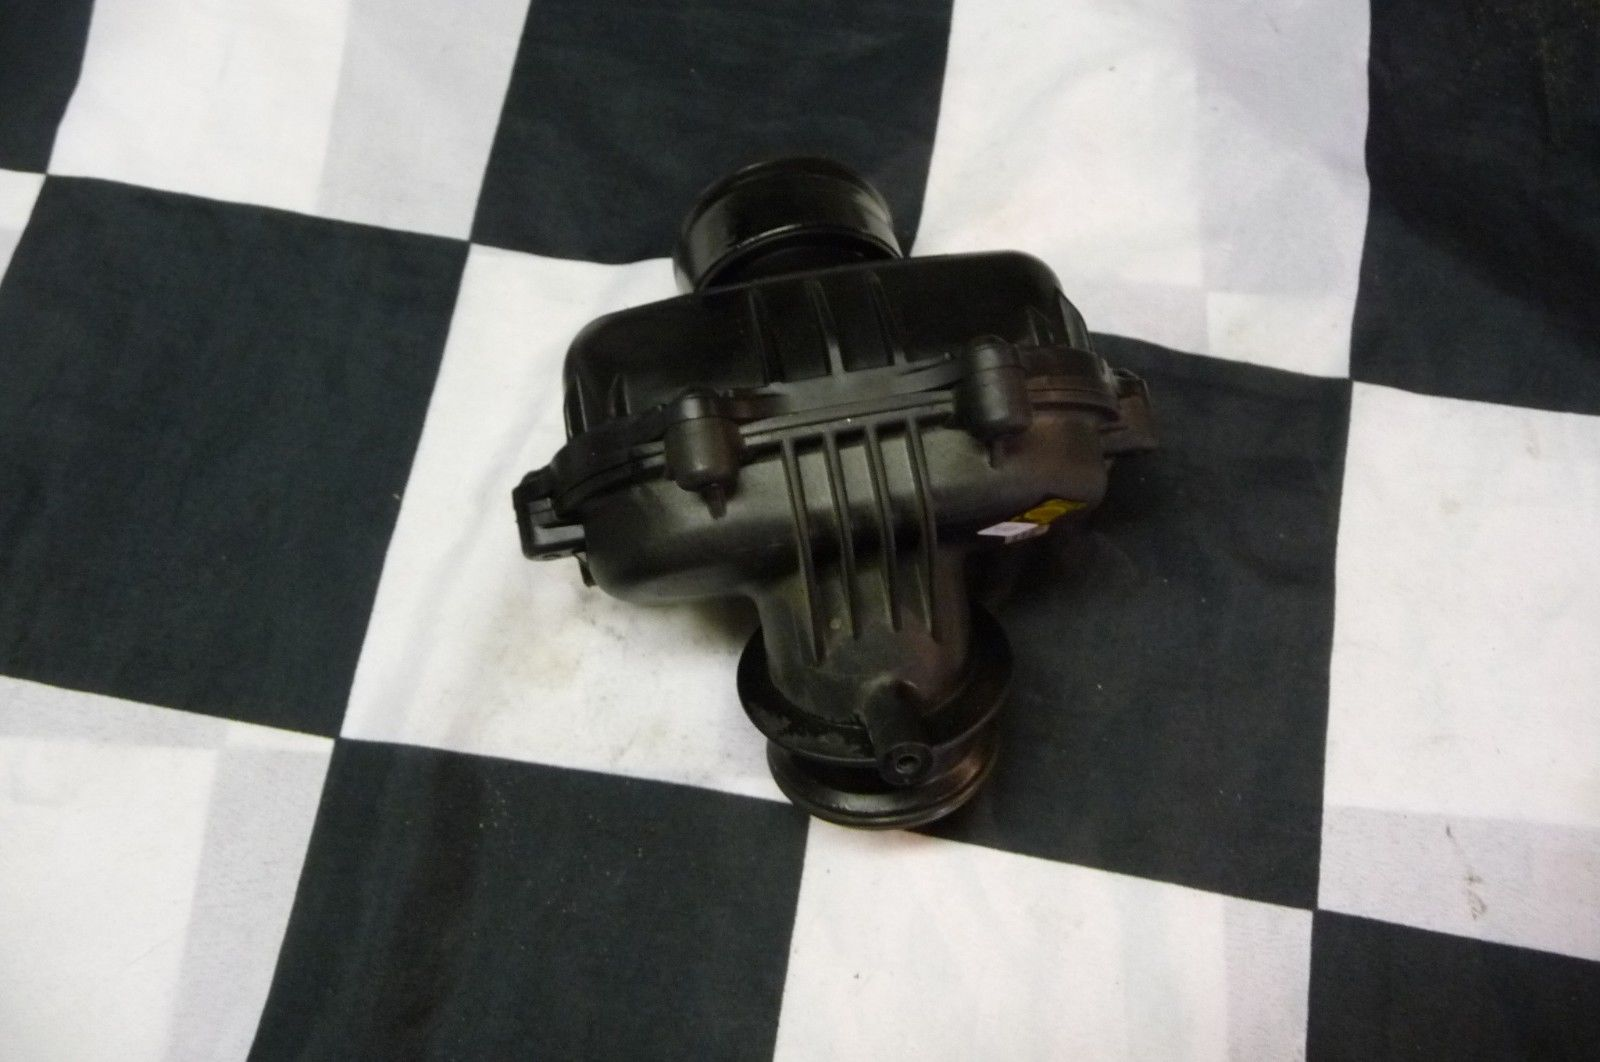 Mercedes Benz Sprinter 2500 3500 Engine Air Intake Resonator A 6421403187 OEM OE